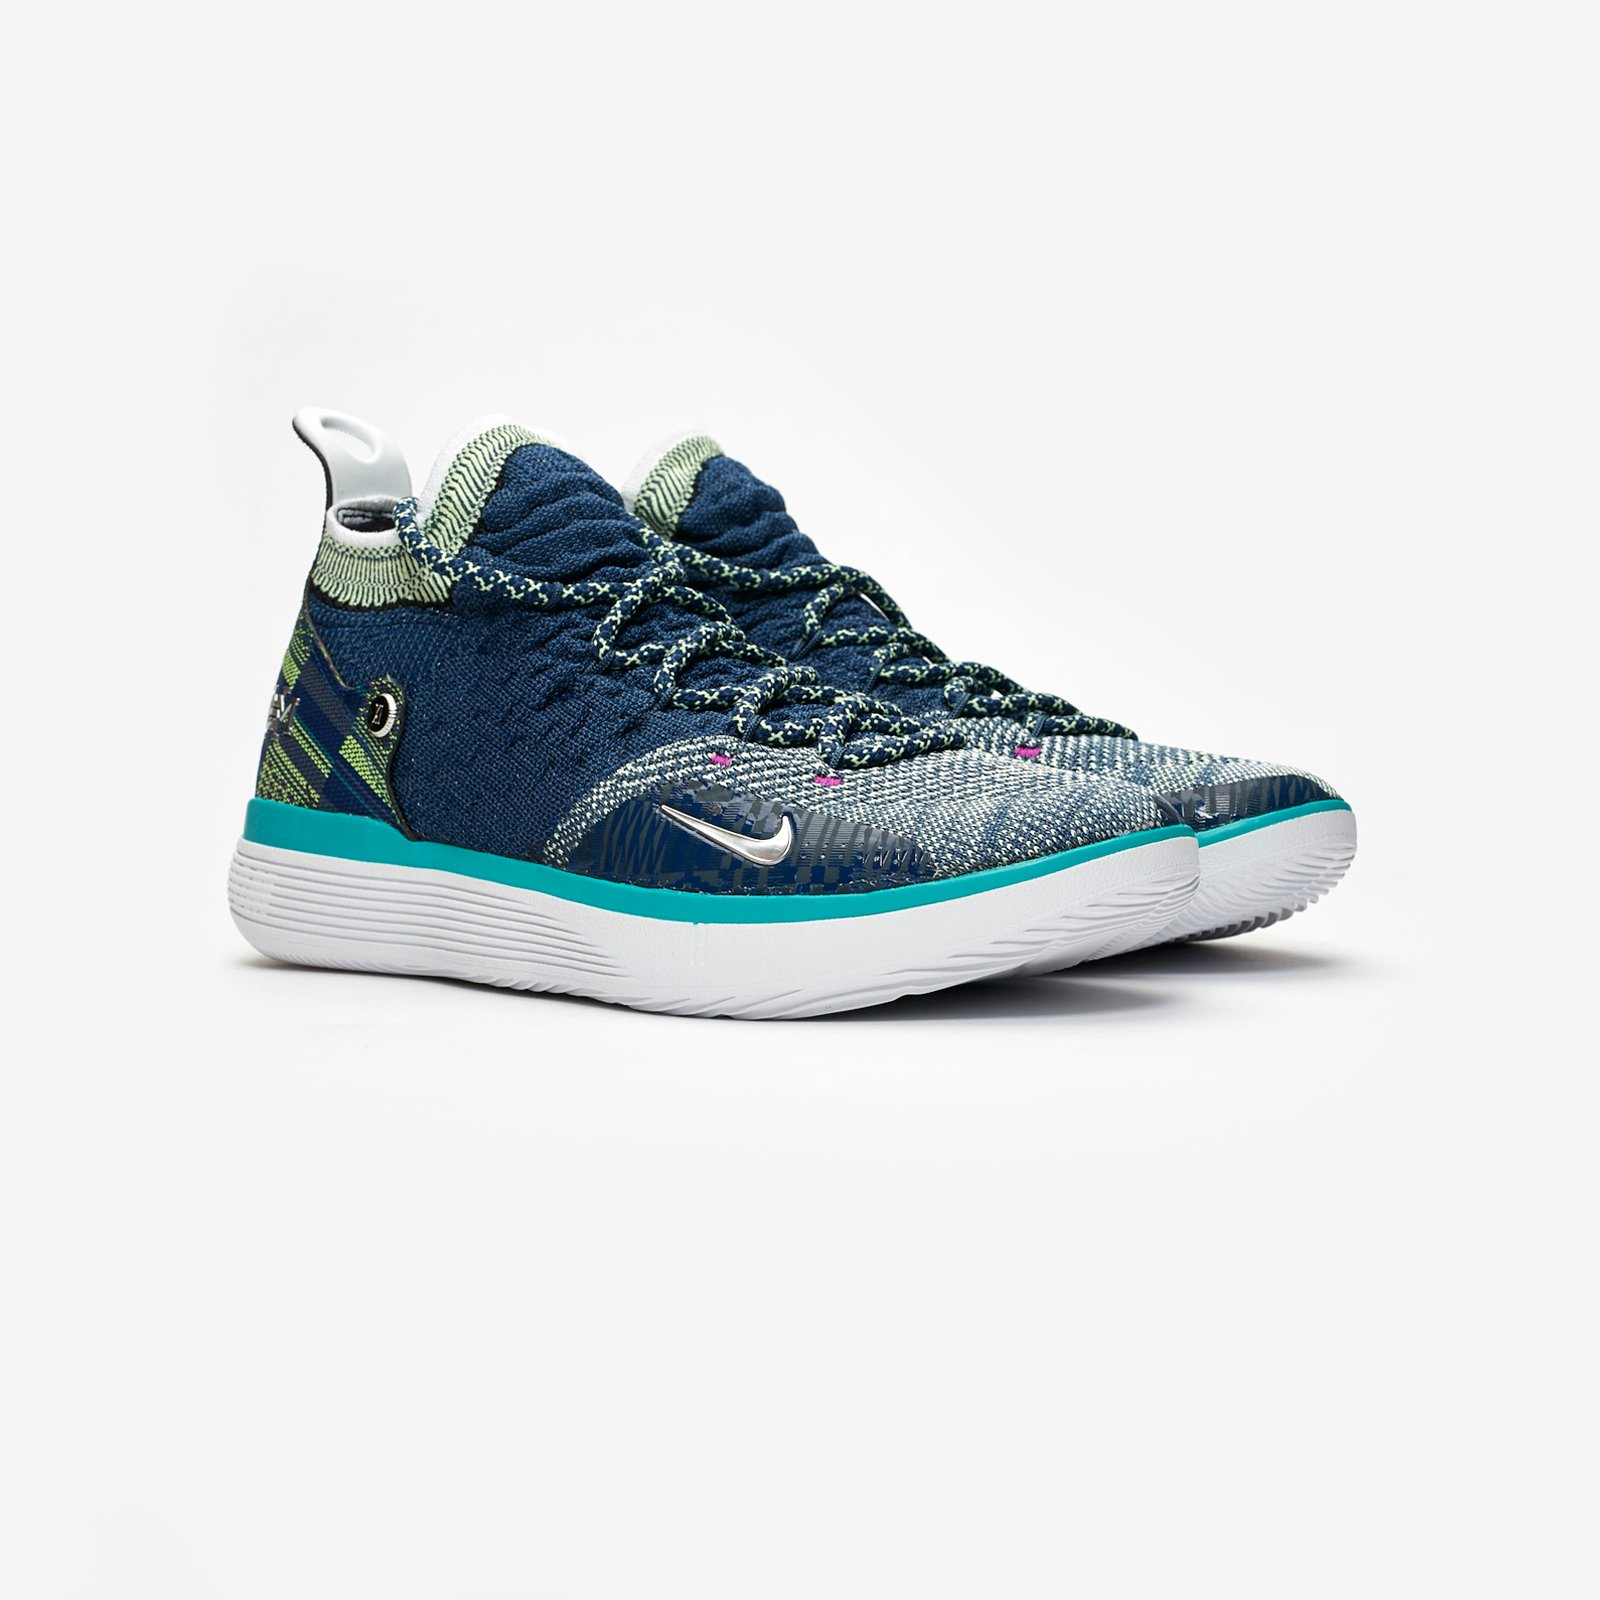 ac76bac2c6096e Nike Zoom KD11 BHM - Bq6245-400 - Sneakersnstuff